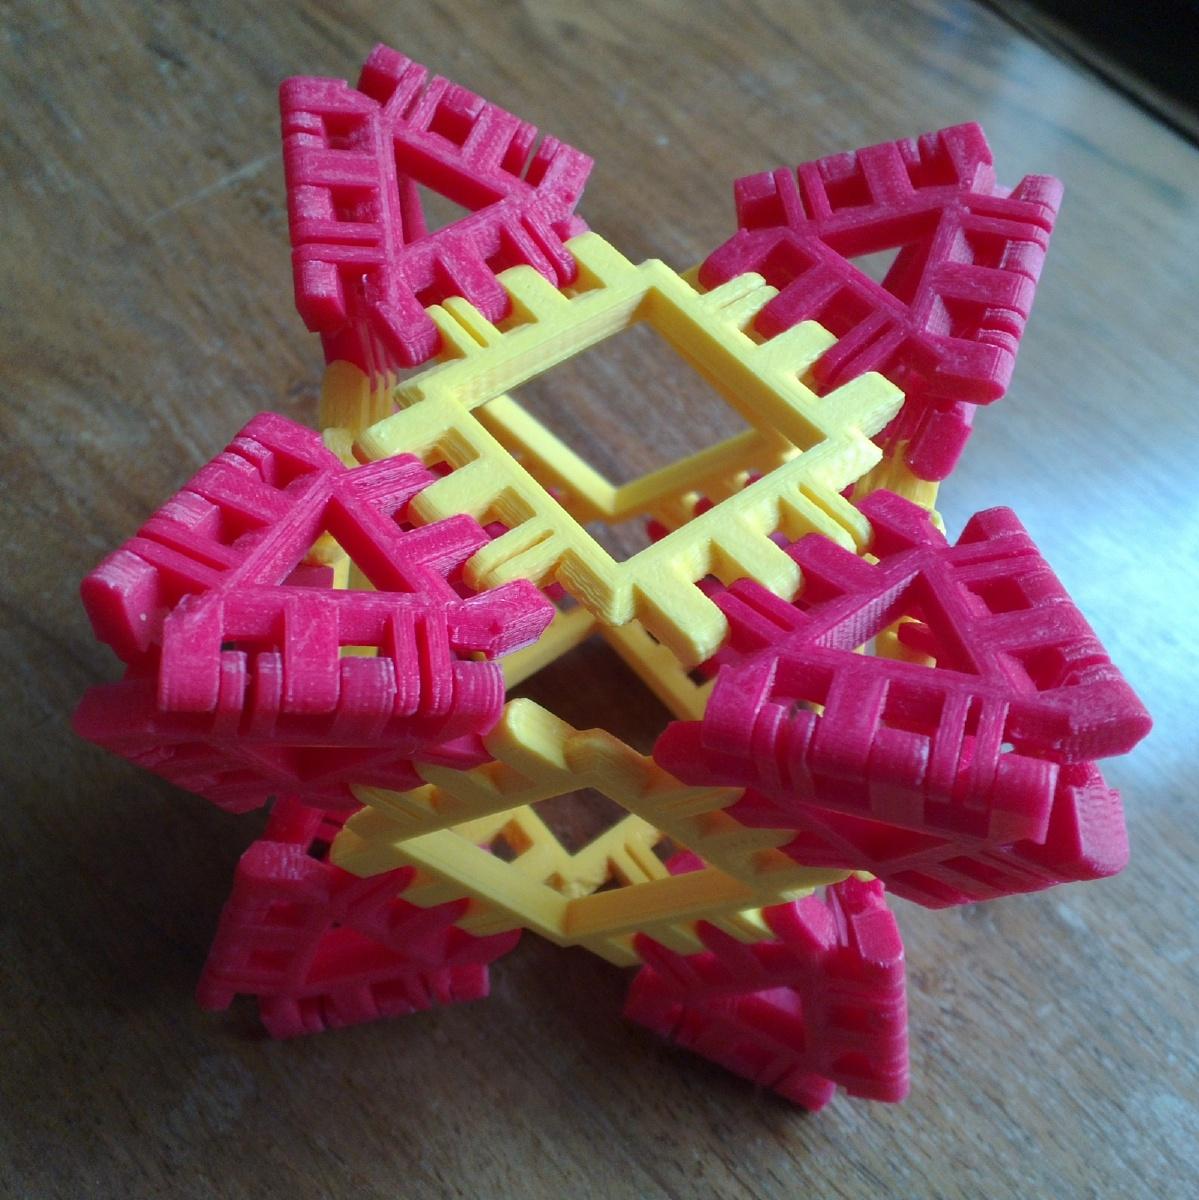 Spiky Cuboctahedron